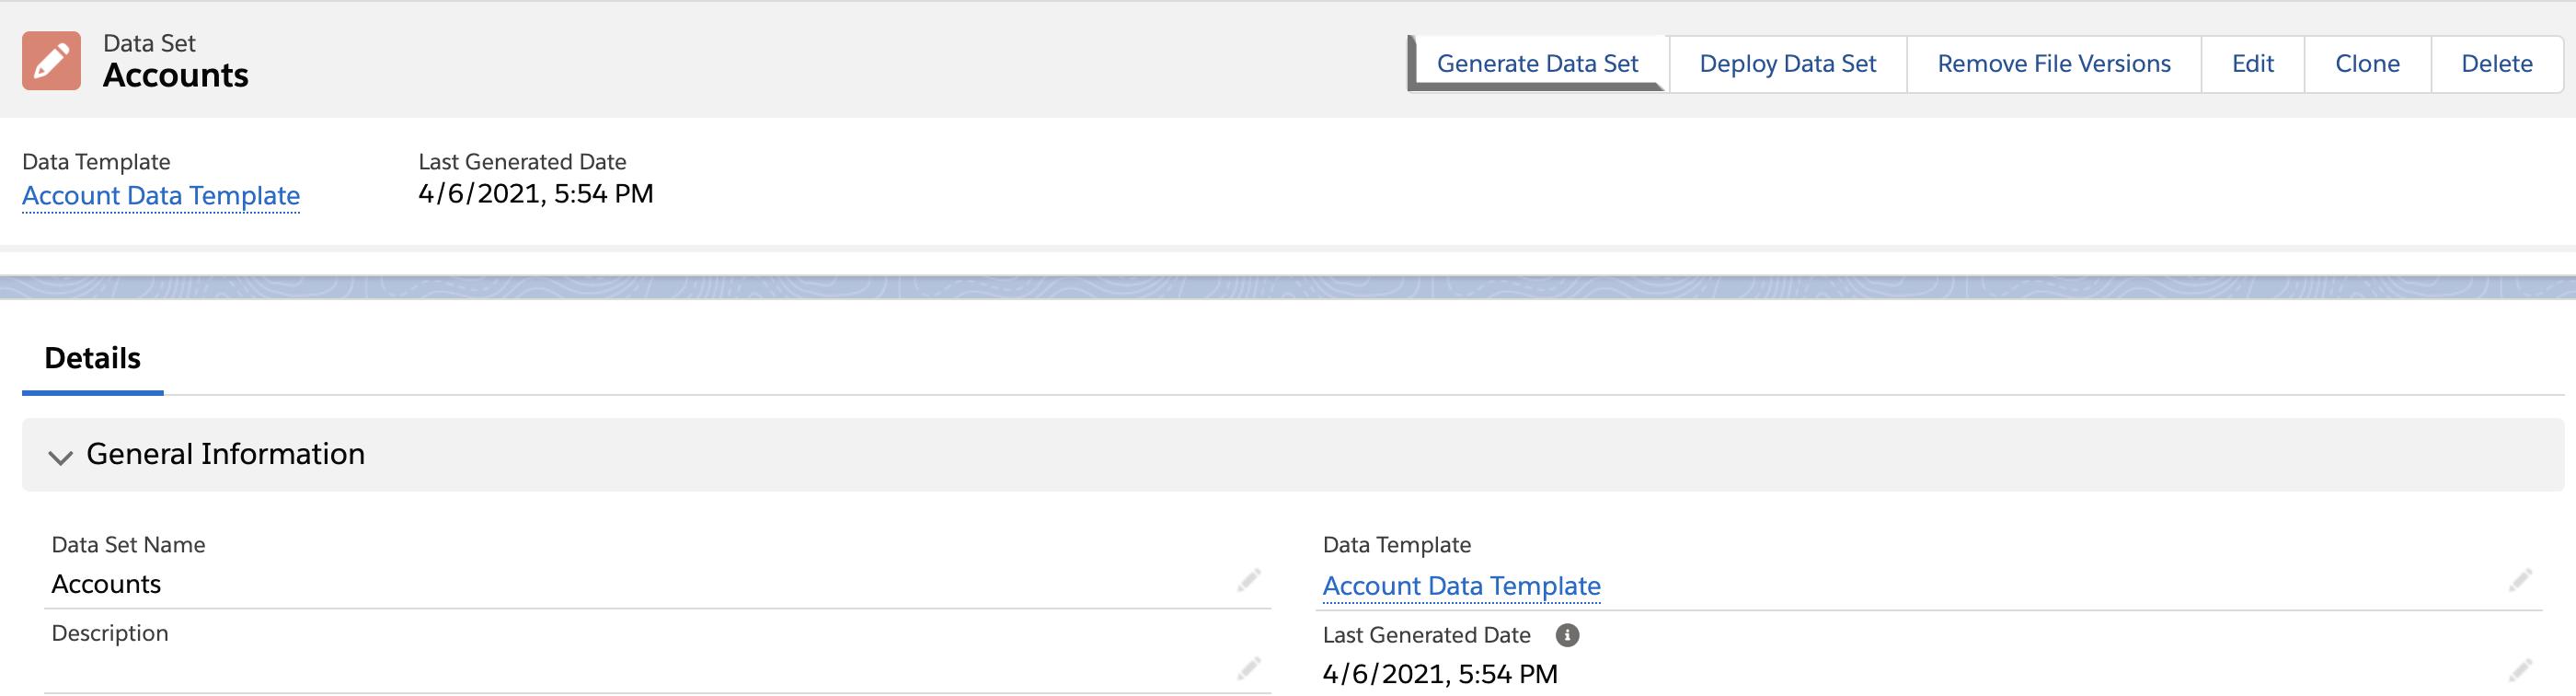 Generate data set button